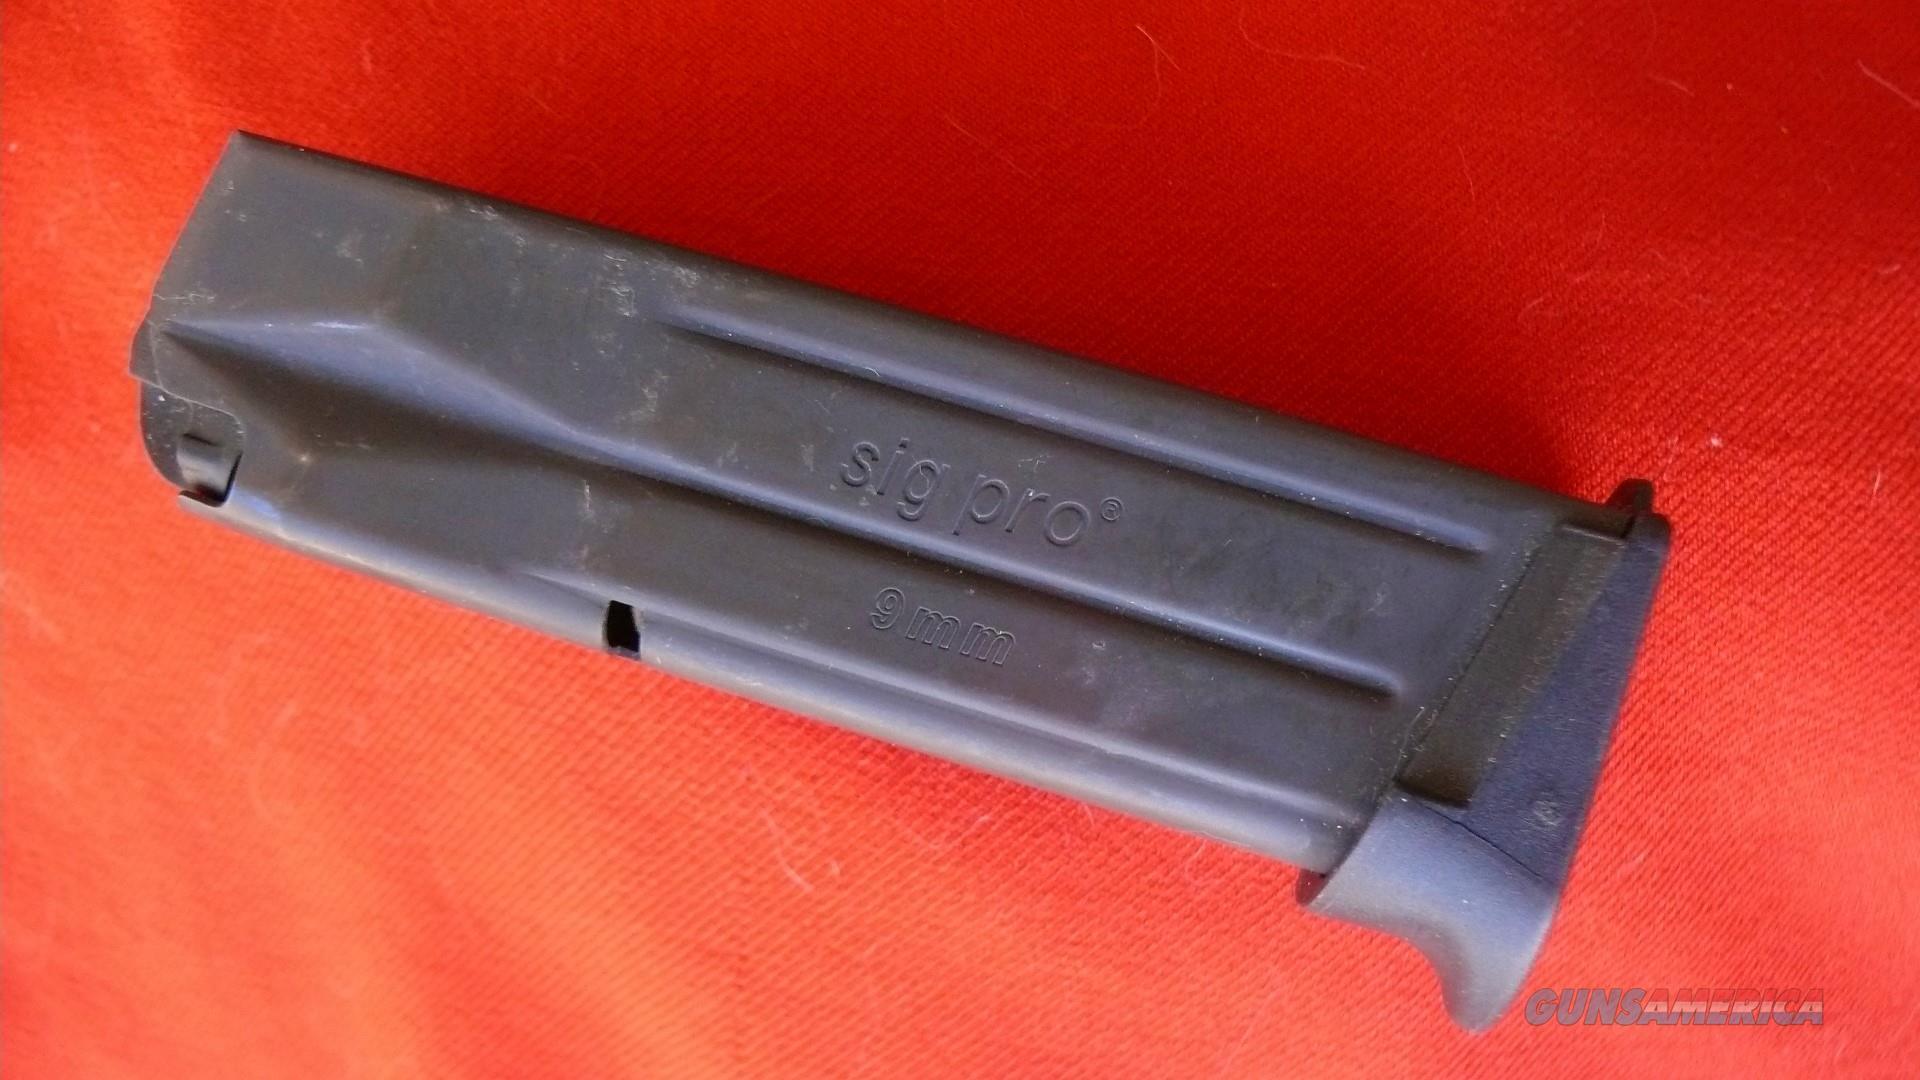 Original FACTORY 15 rd 9mm SIGPRO magazine  Sig Sauer 9mm Luger  Non-Guns > Magazines & Clips > Pistol Magazines > Sig